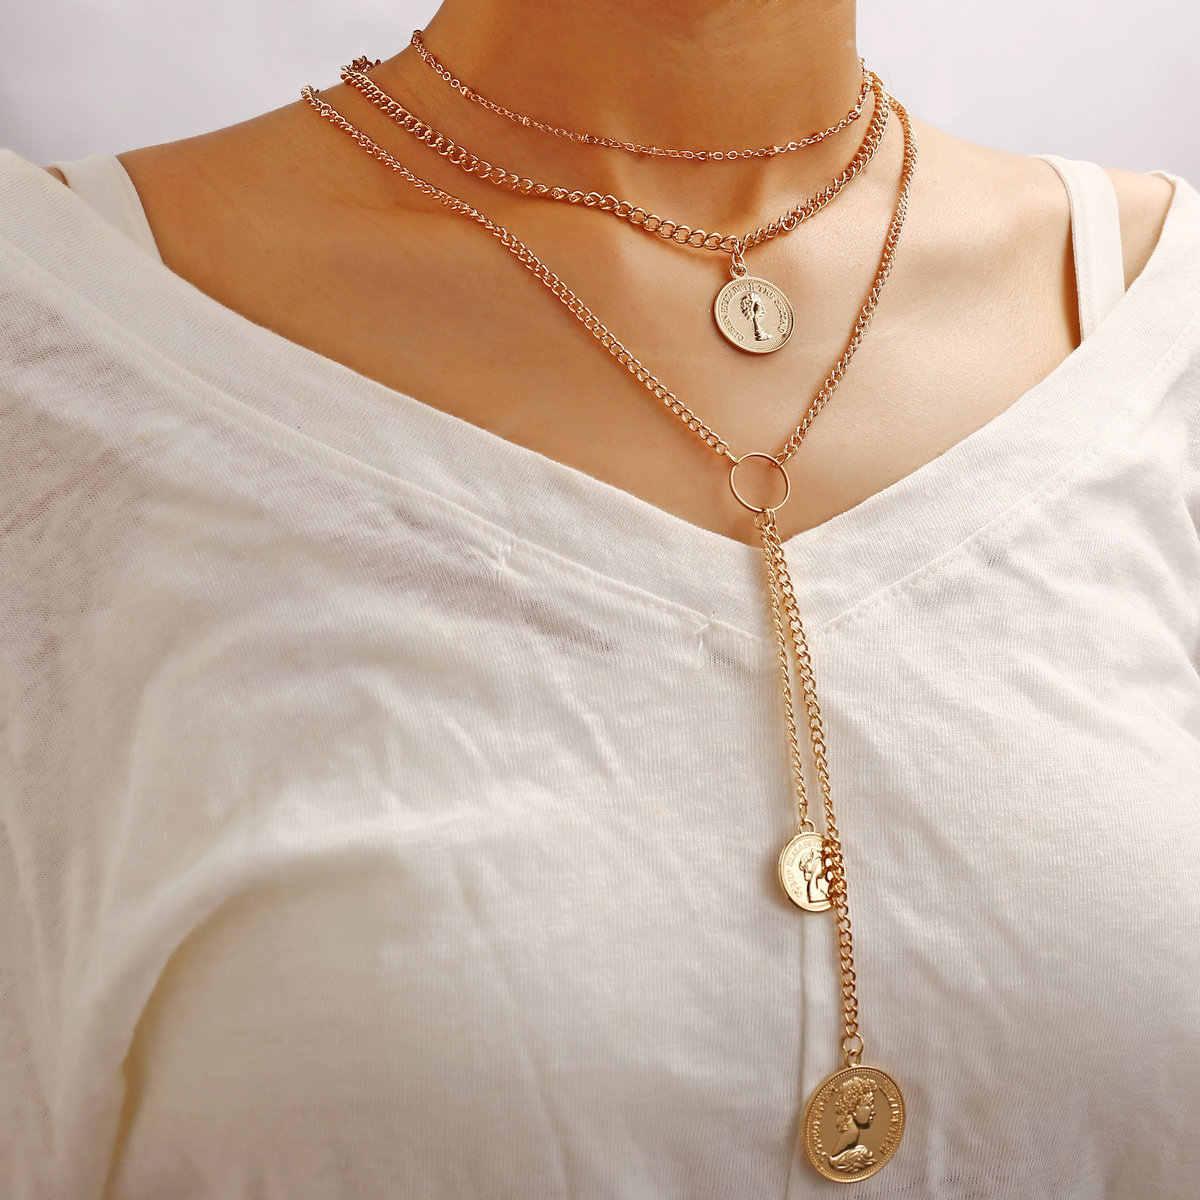 Europeu novo 3-camada cabeça selo longo colar retro moda simples wafer multi-camada colar feminino ins estilo